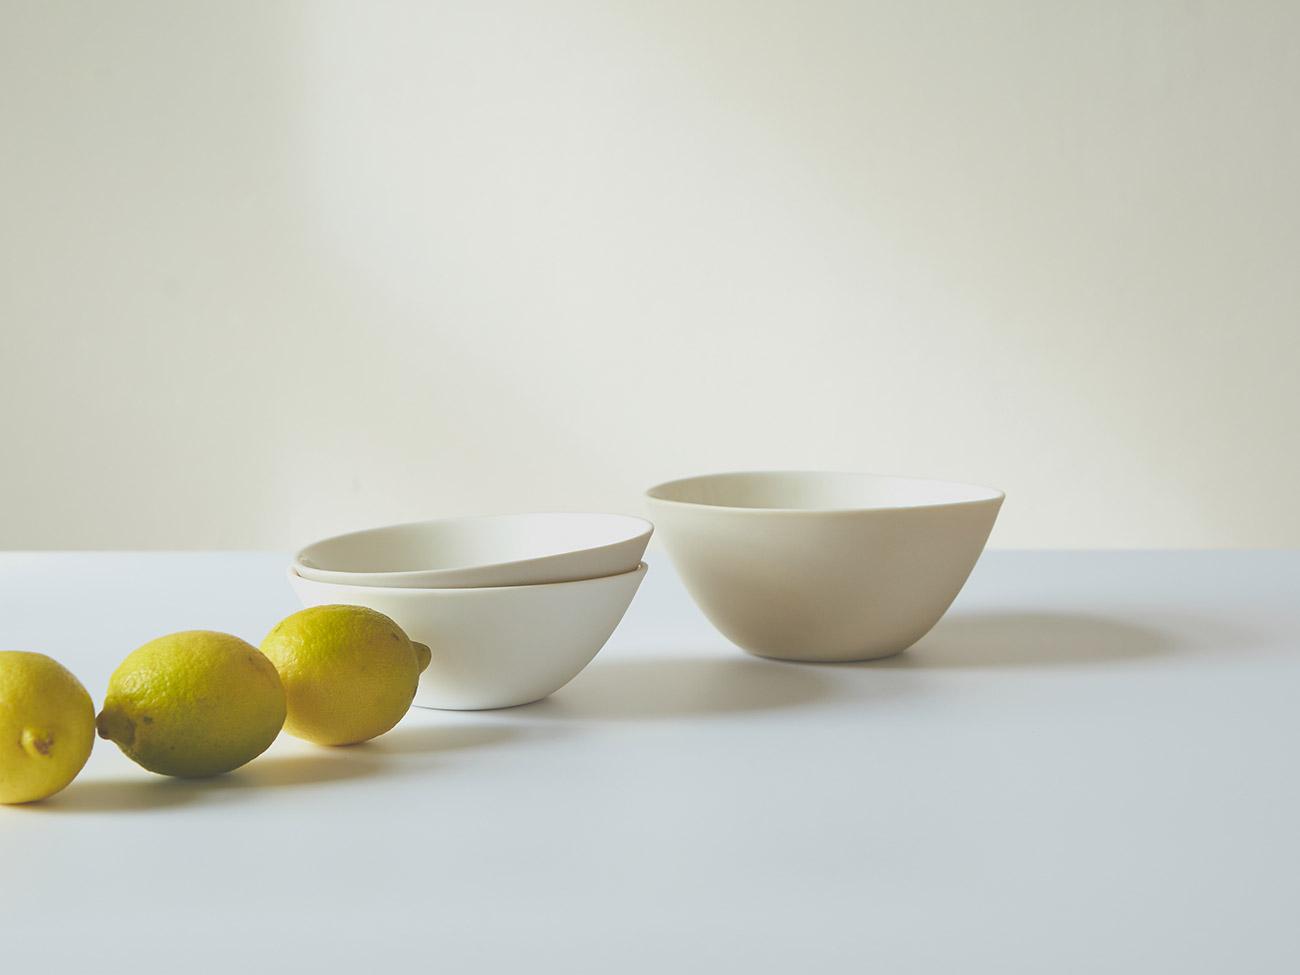 toki-ton-bowls-schüssel-hamburg